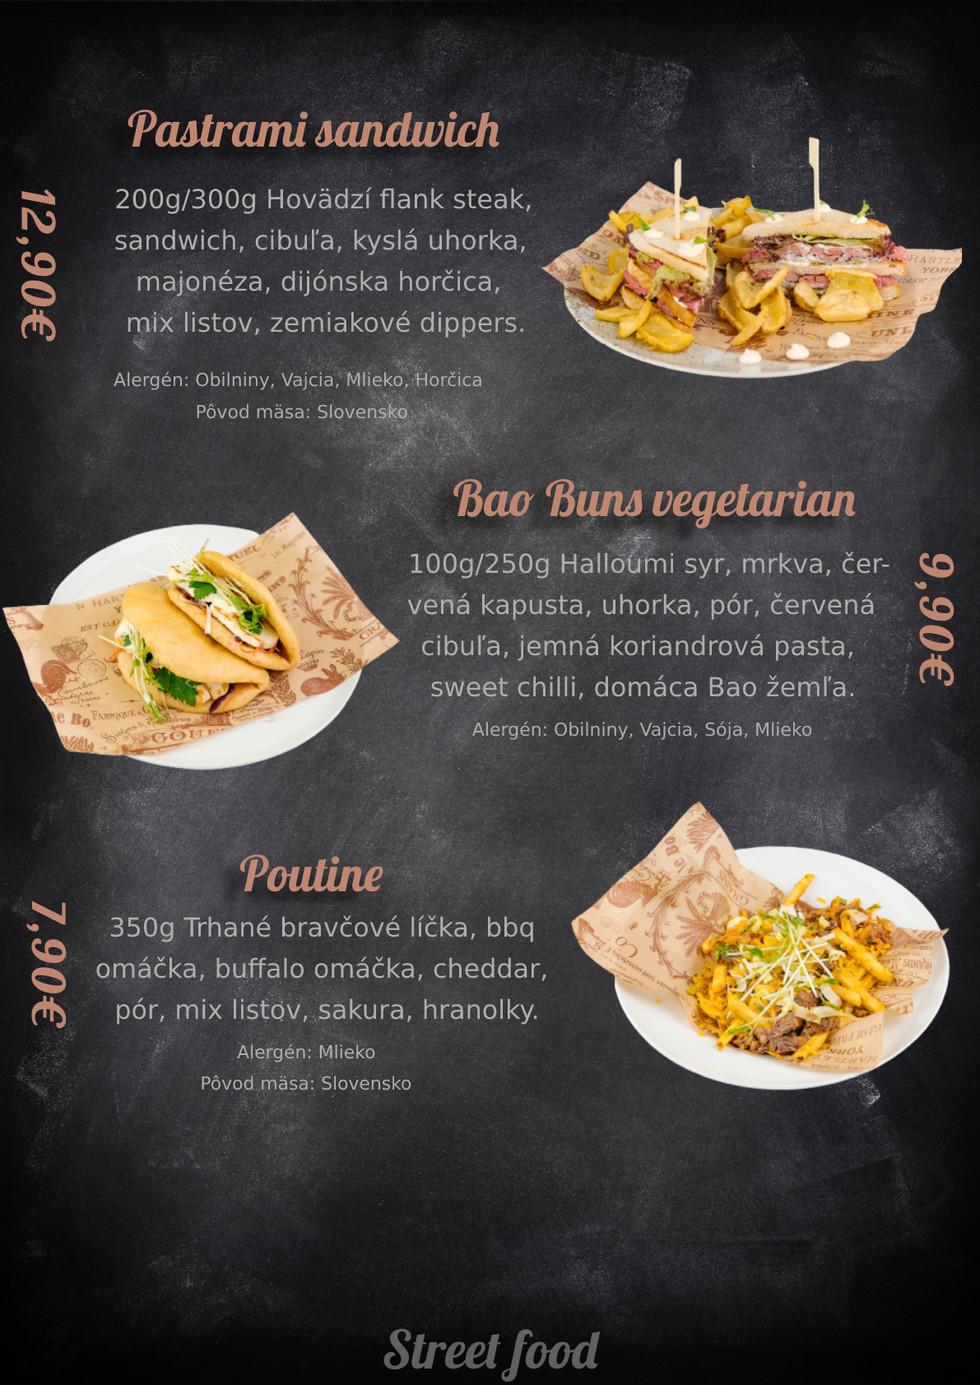 06_Street food-pdf (3).jpg